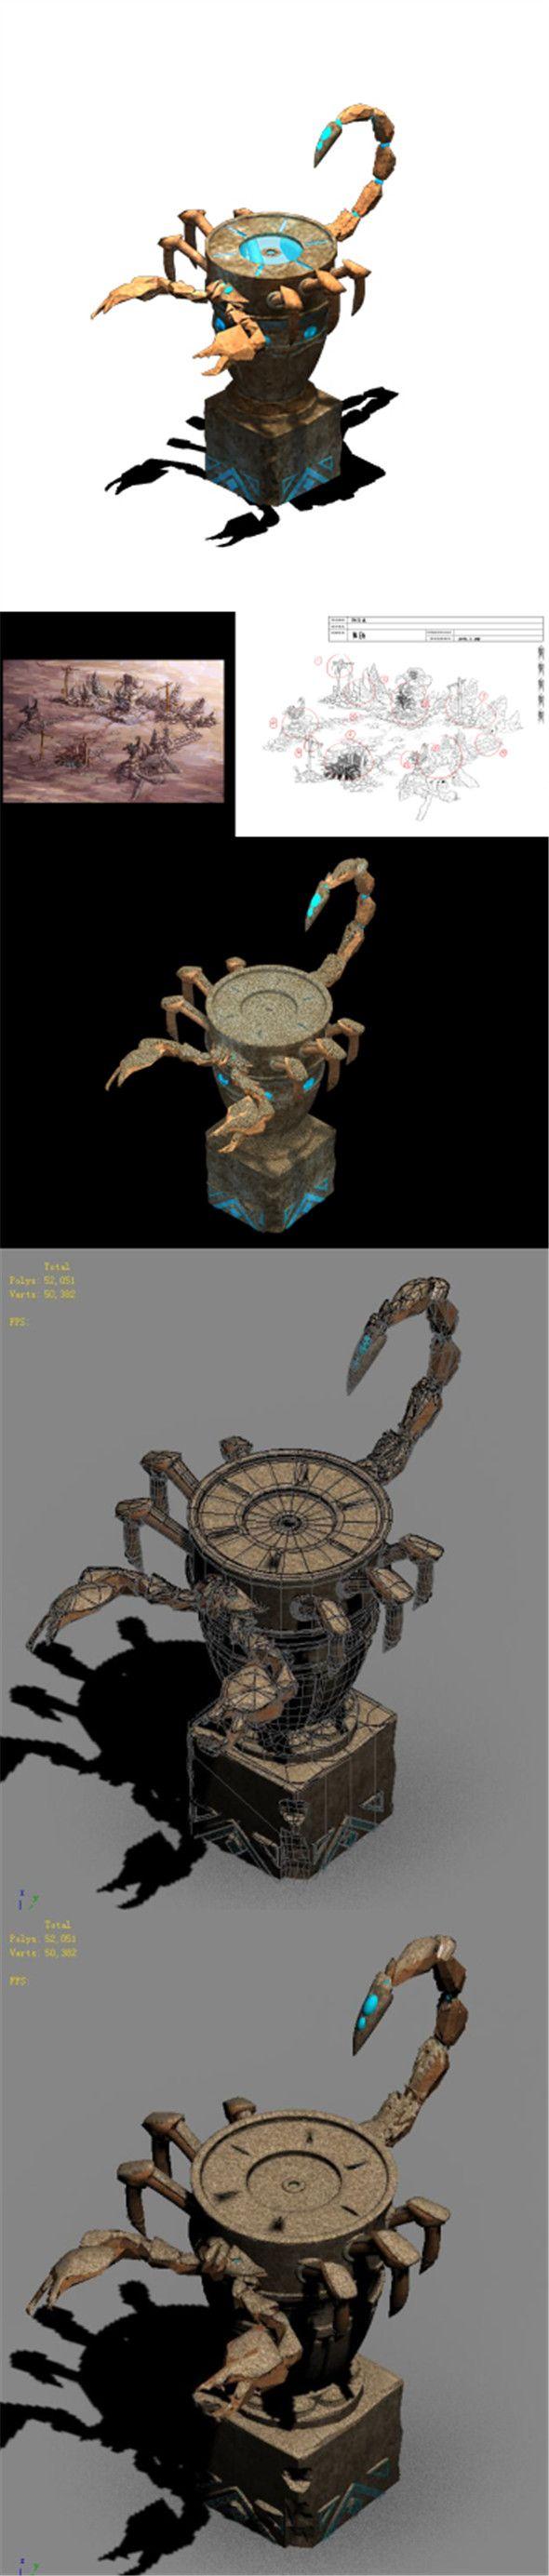 Desert Scorpion Stone (With images) Desert scorpion, Stone